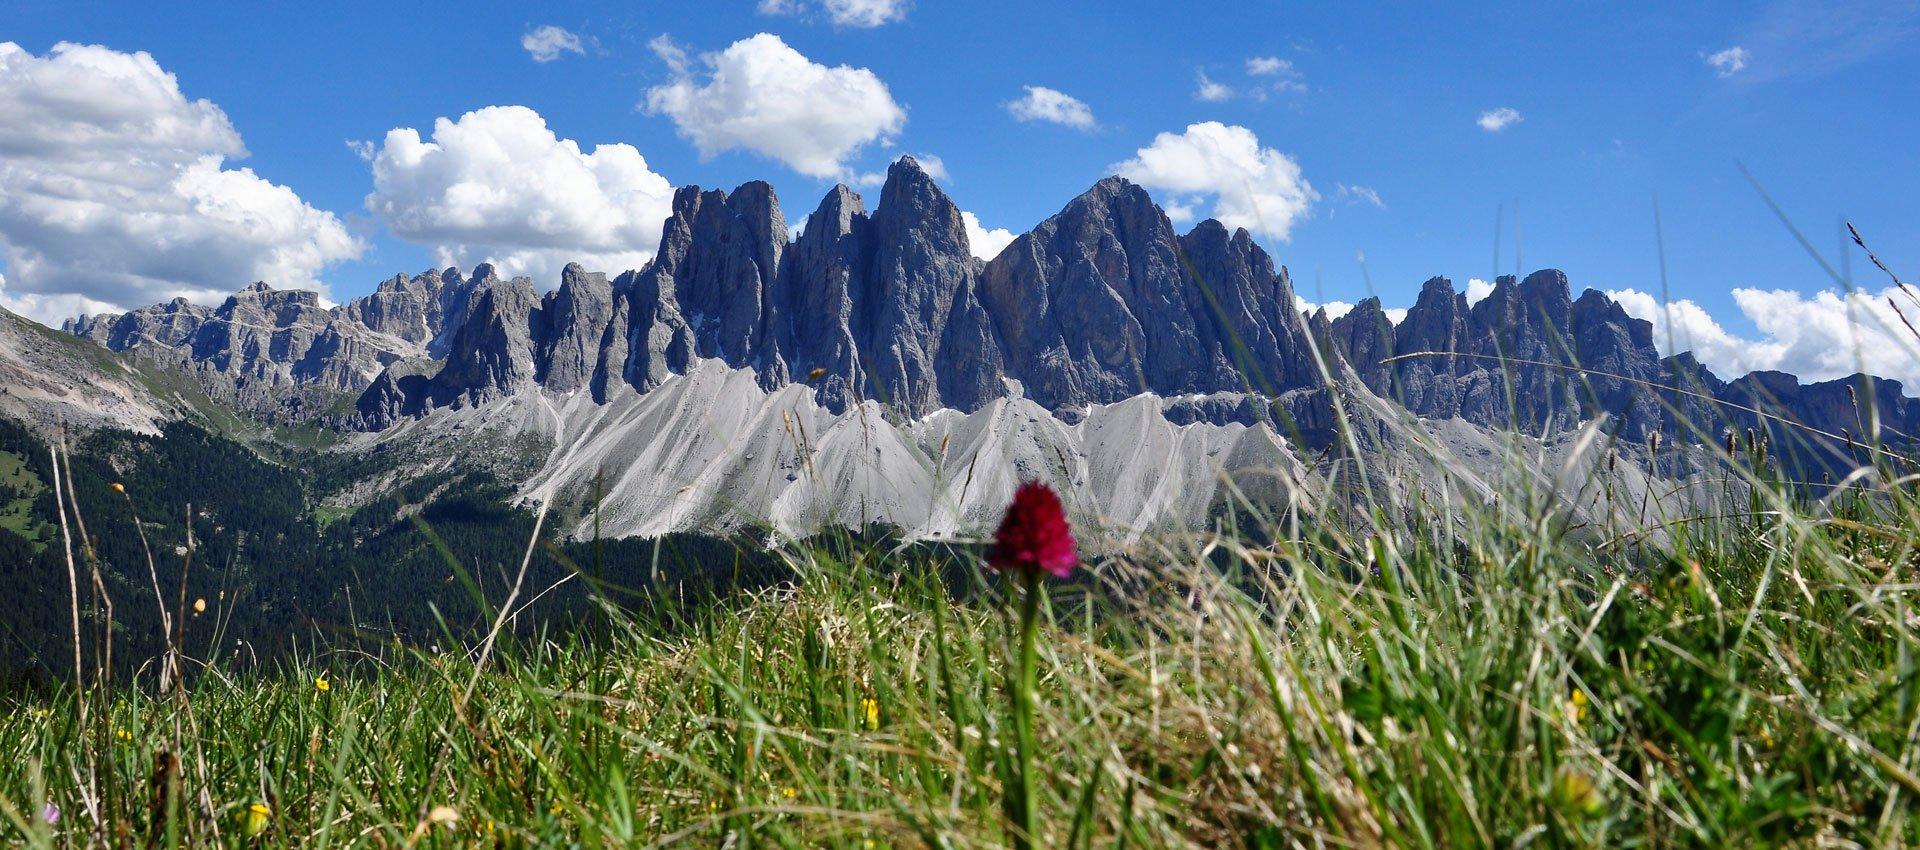 wandern-klettern-sommerurlaub-villnoesstal